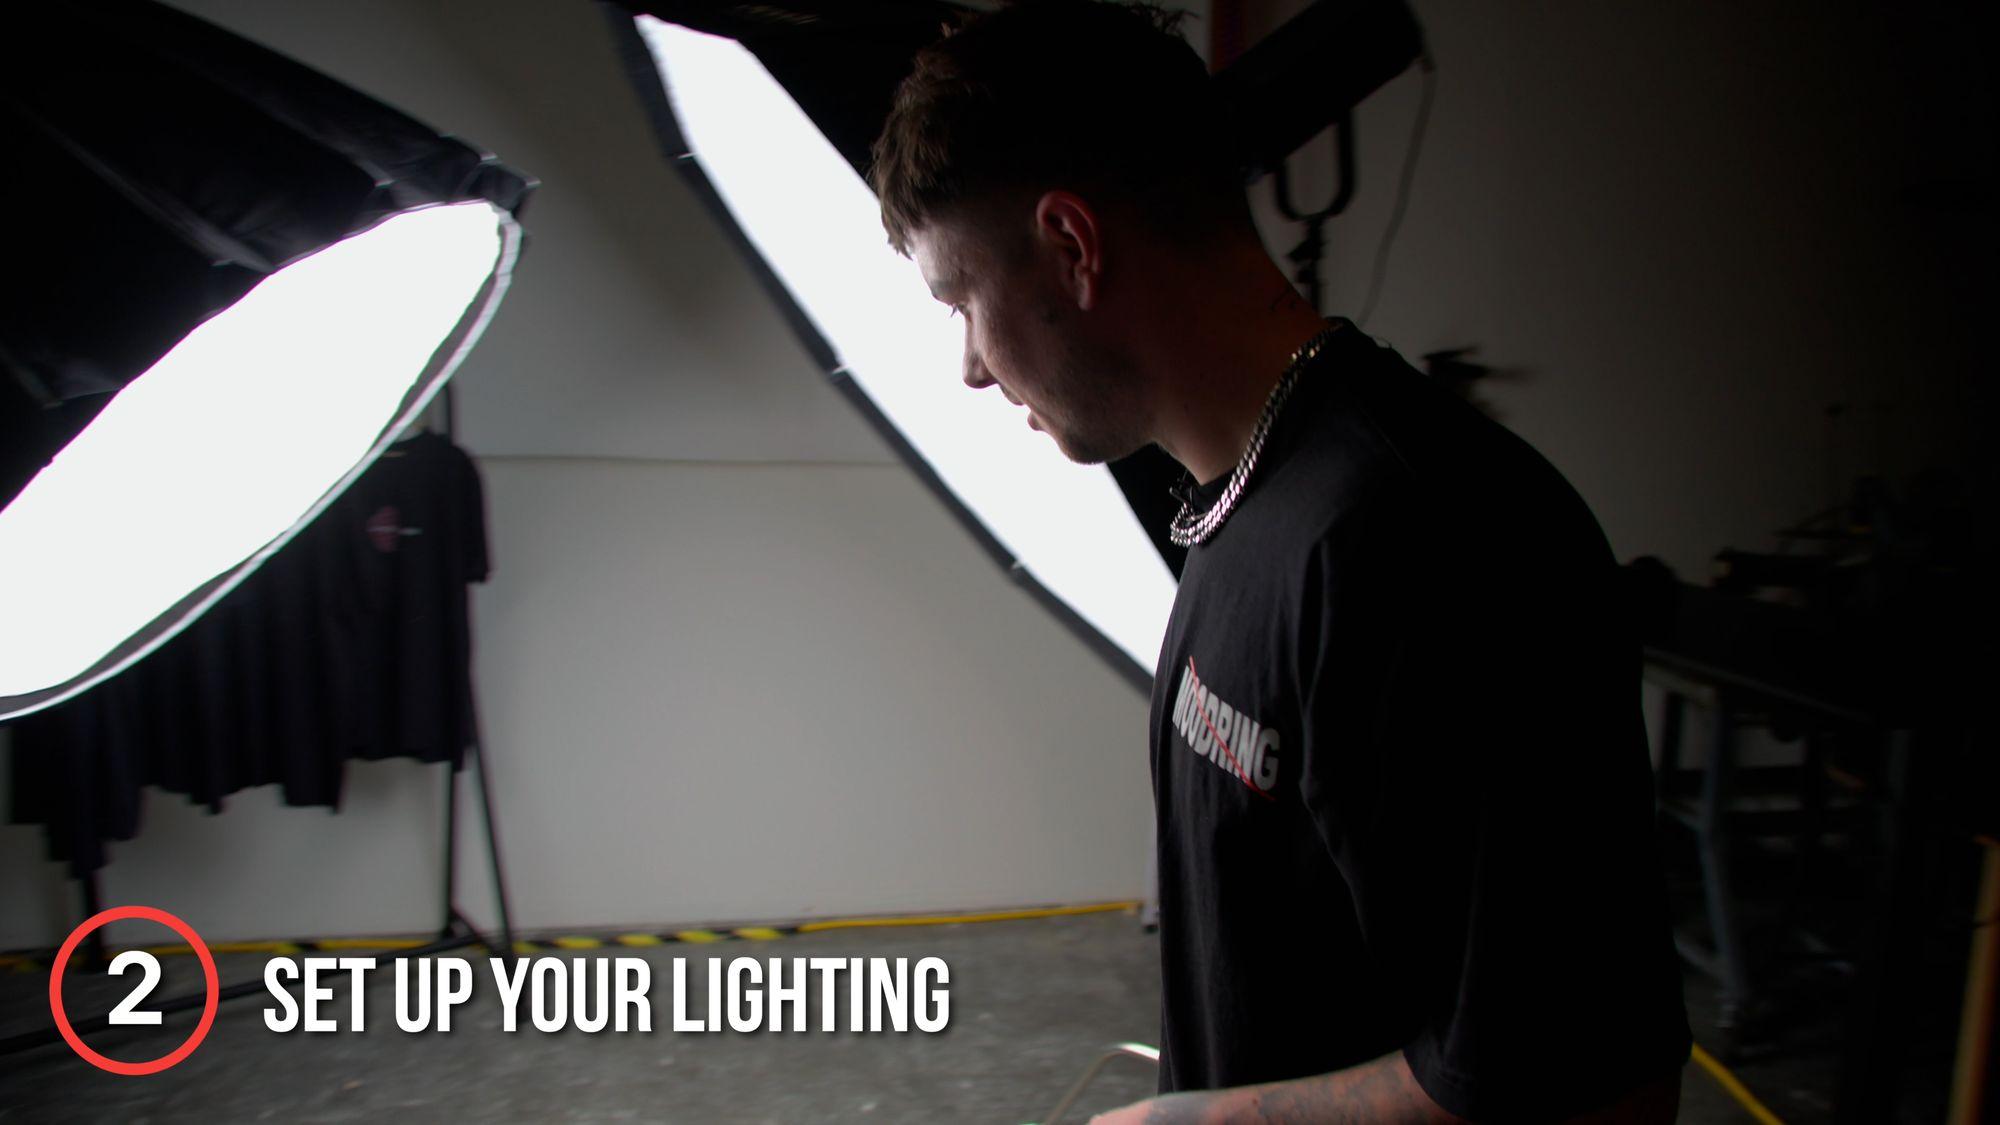 Image of Ieuan Thomas setting up lighting for a flat lay photo shoot